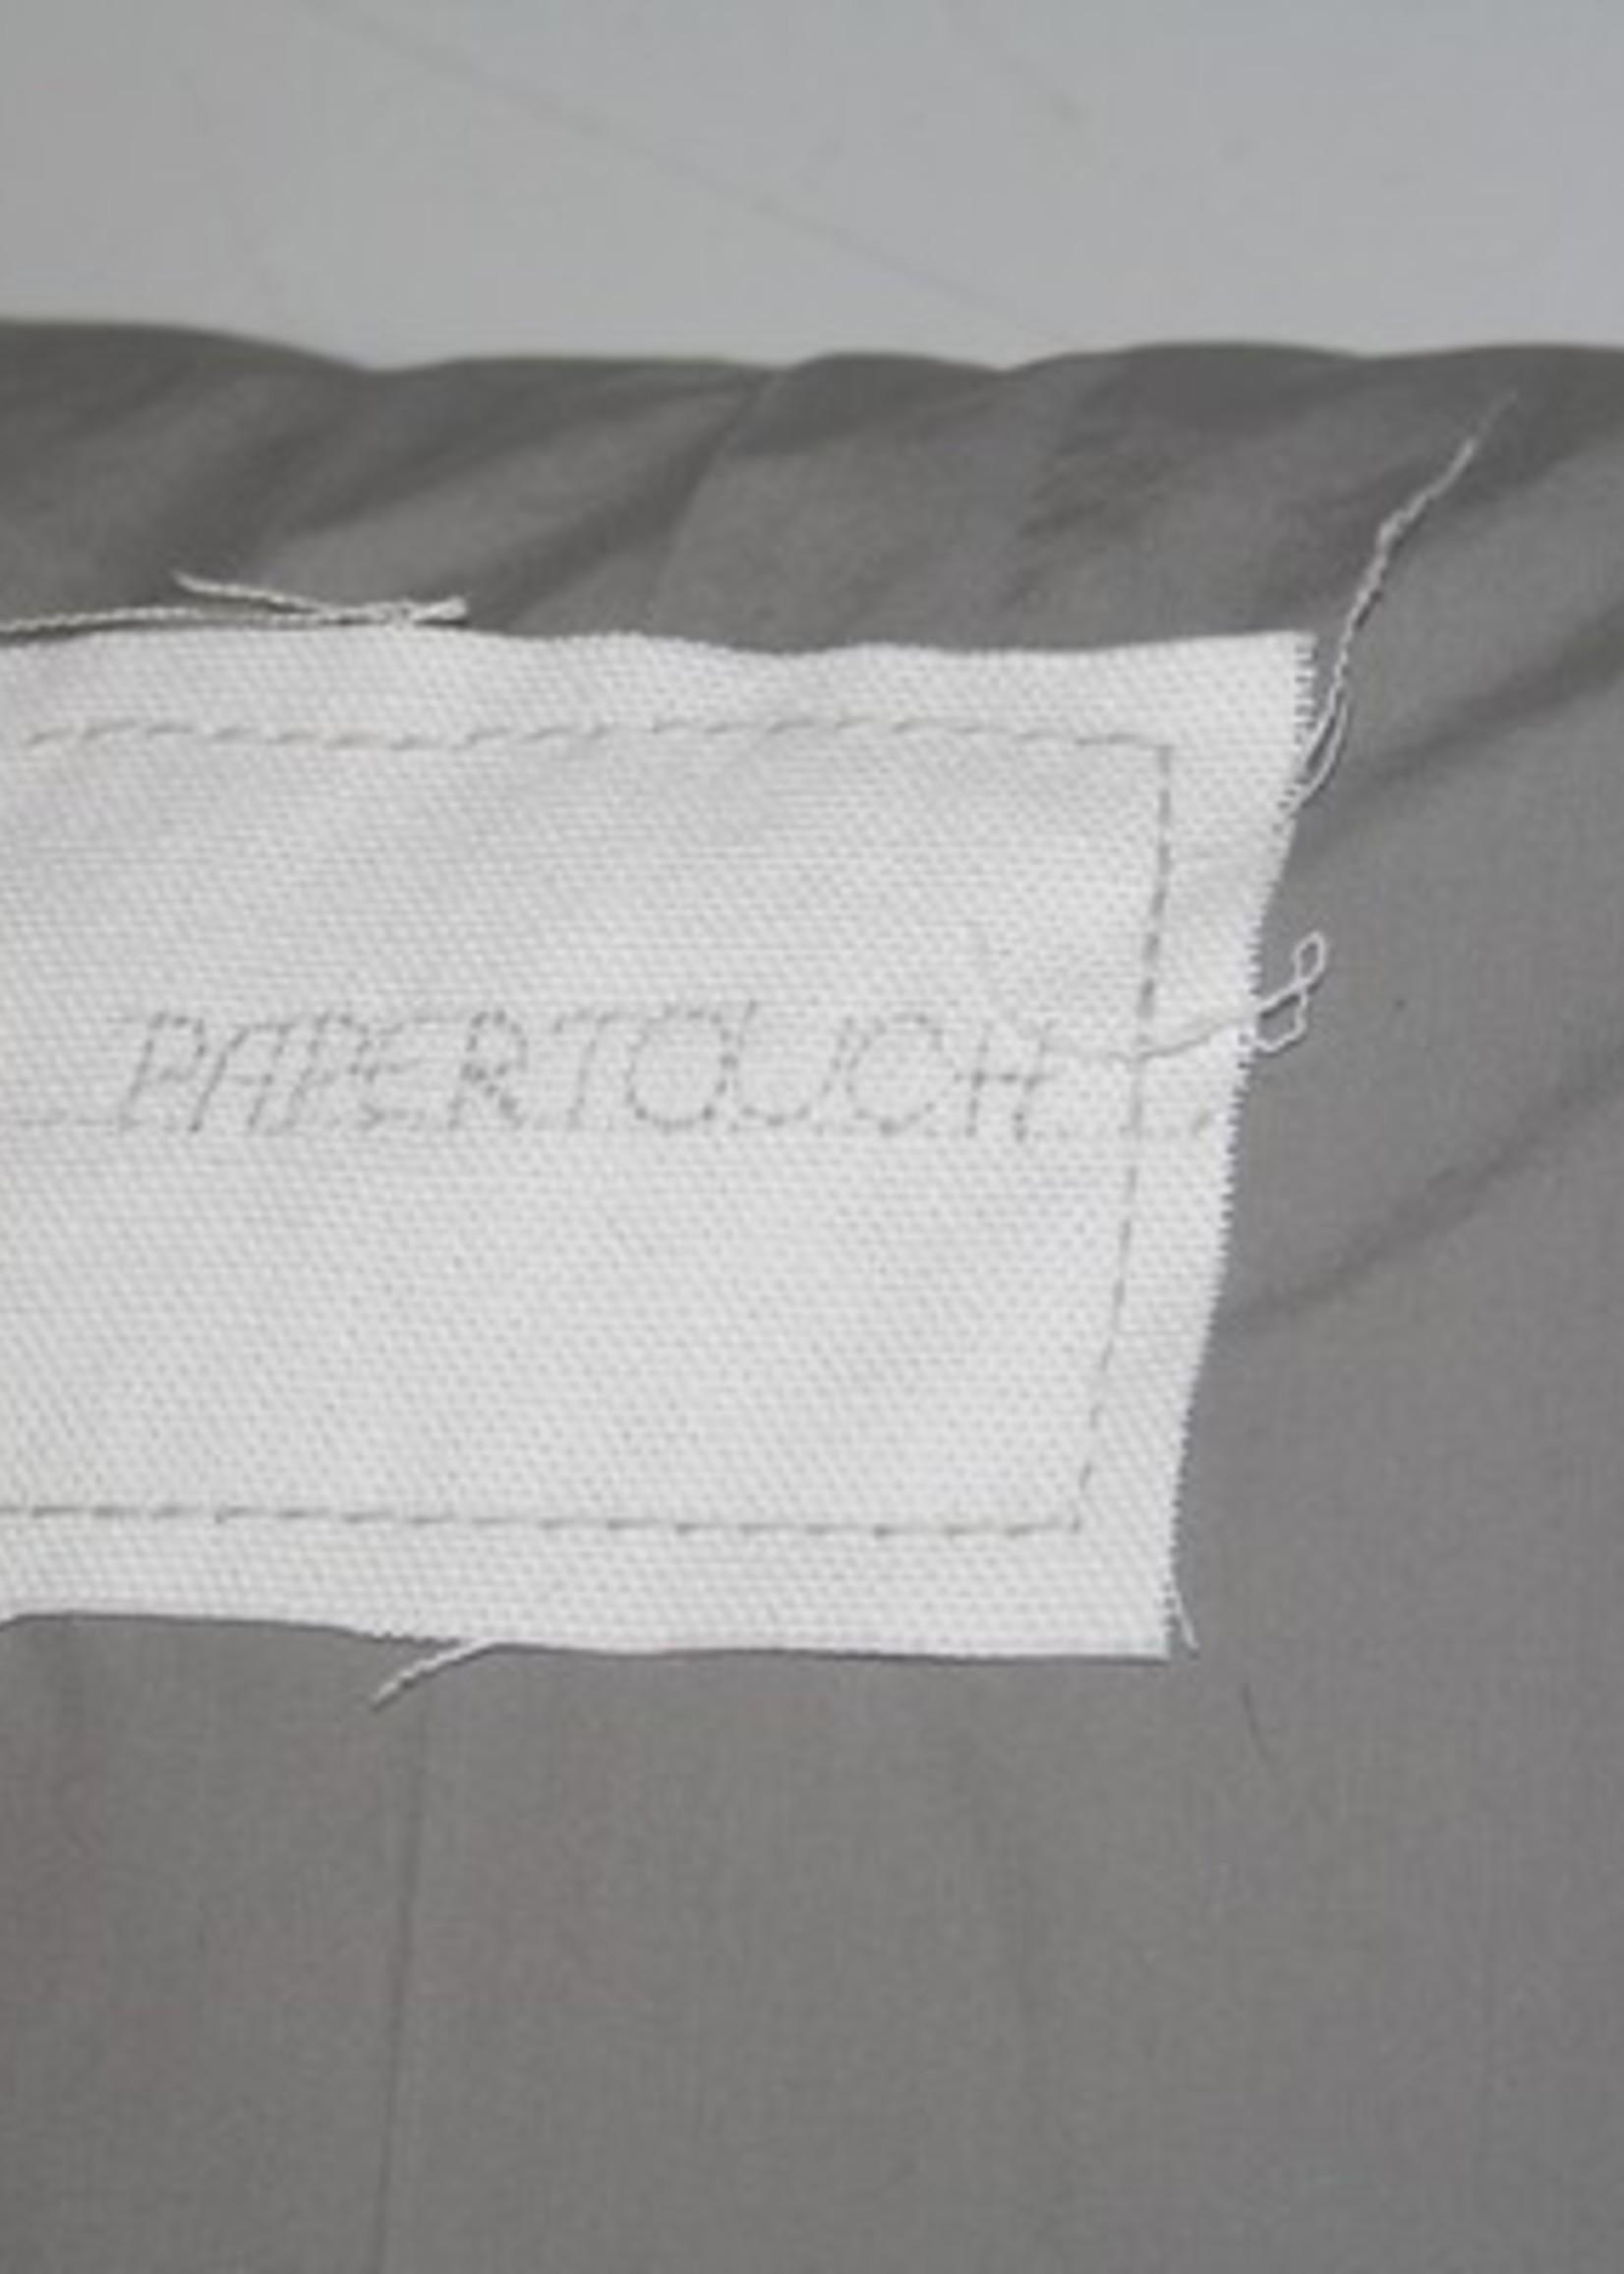 OPDEMAALZOLDER papertouch kussentje